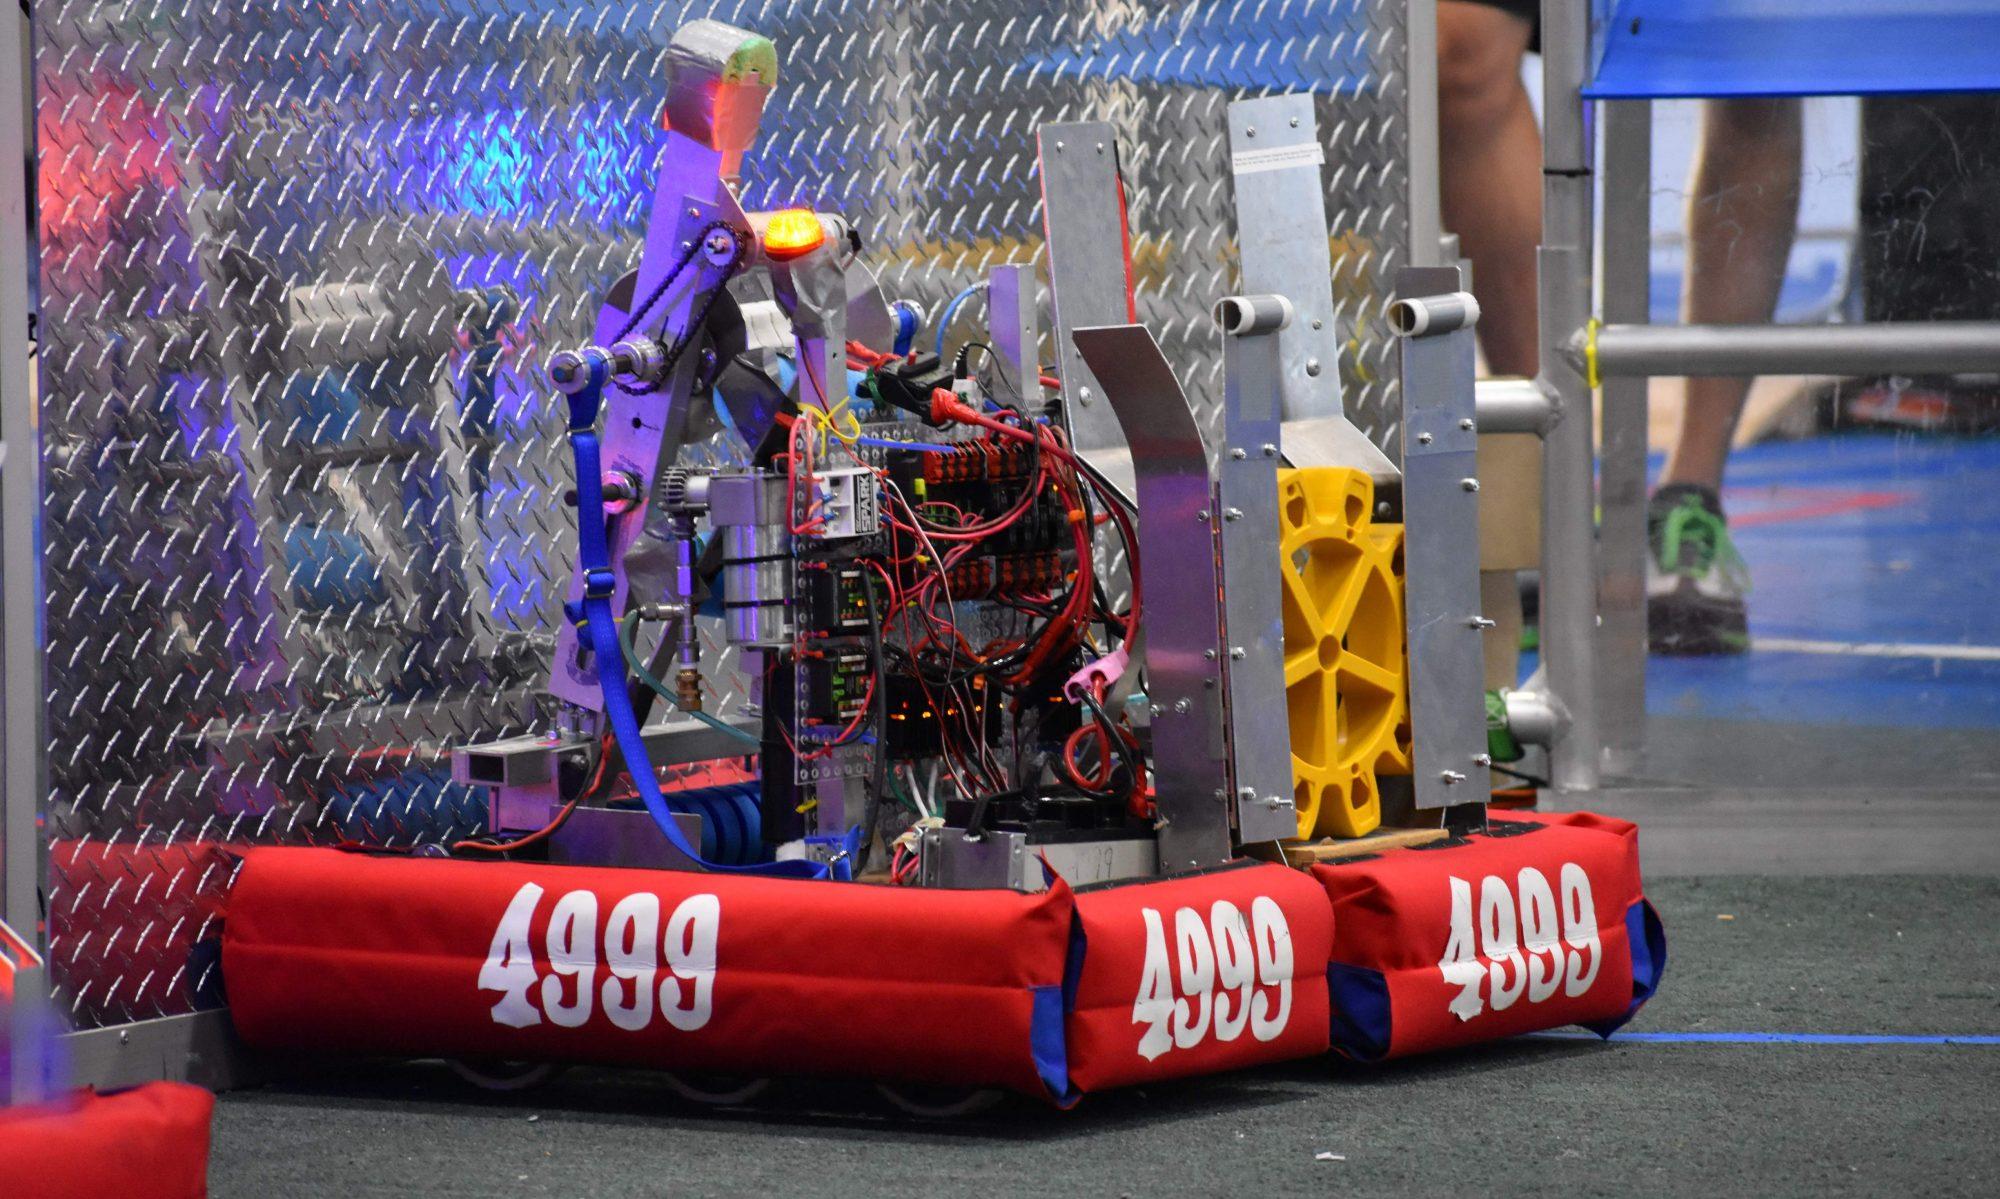 Momentum Robotics